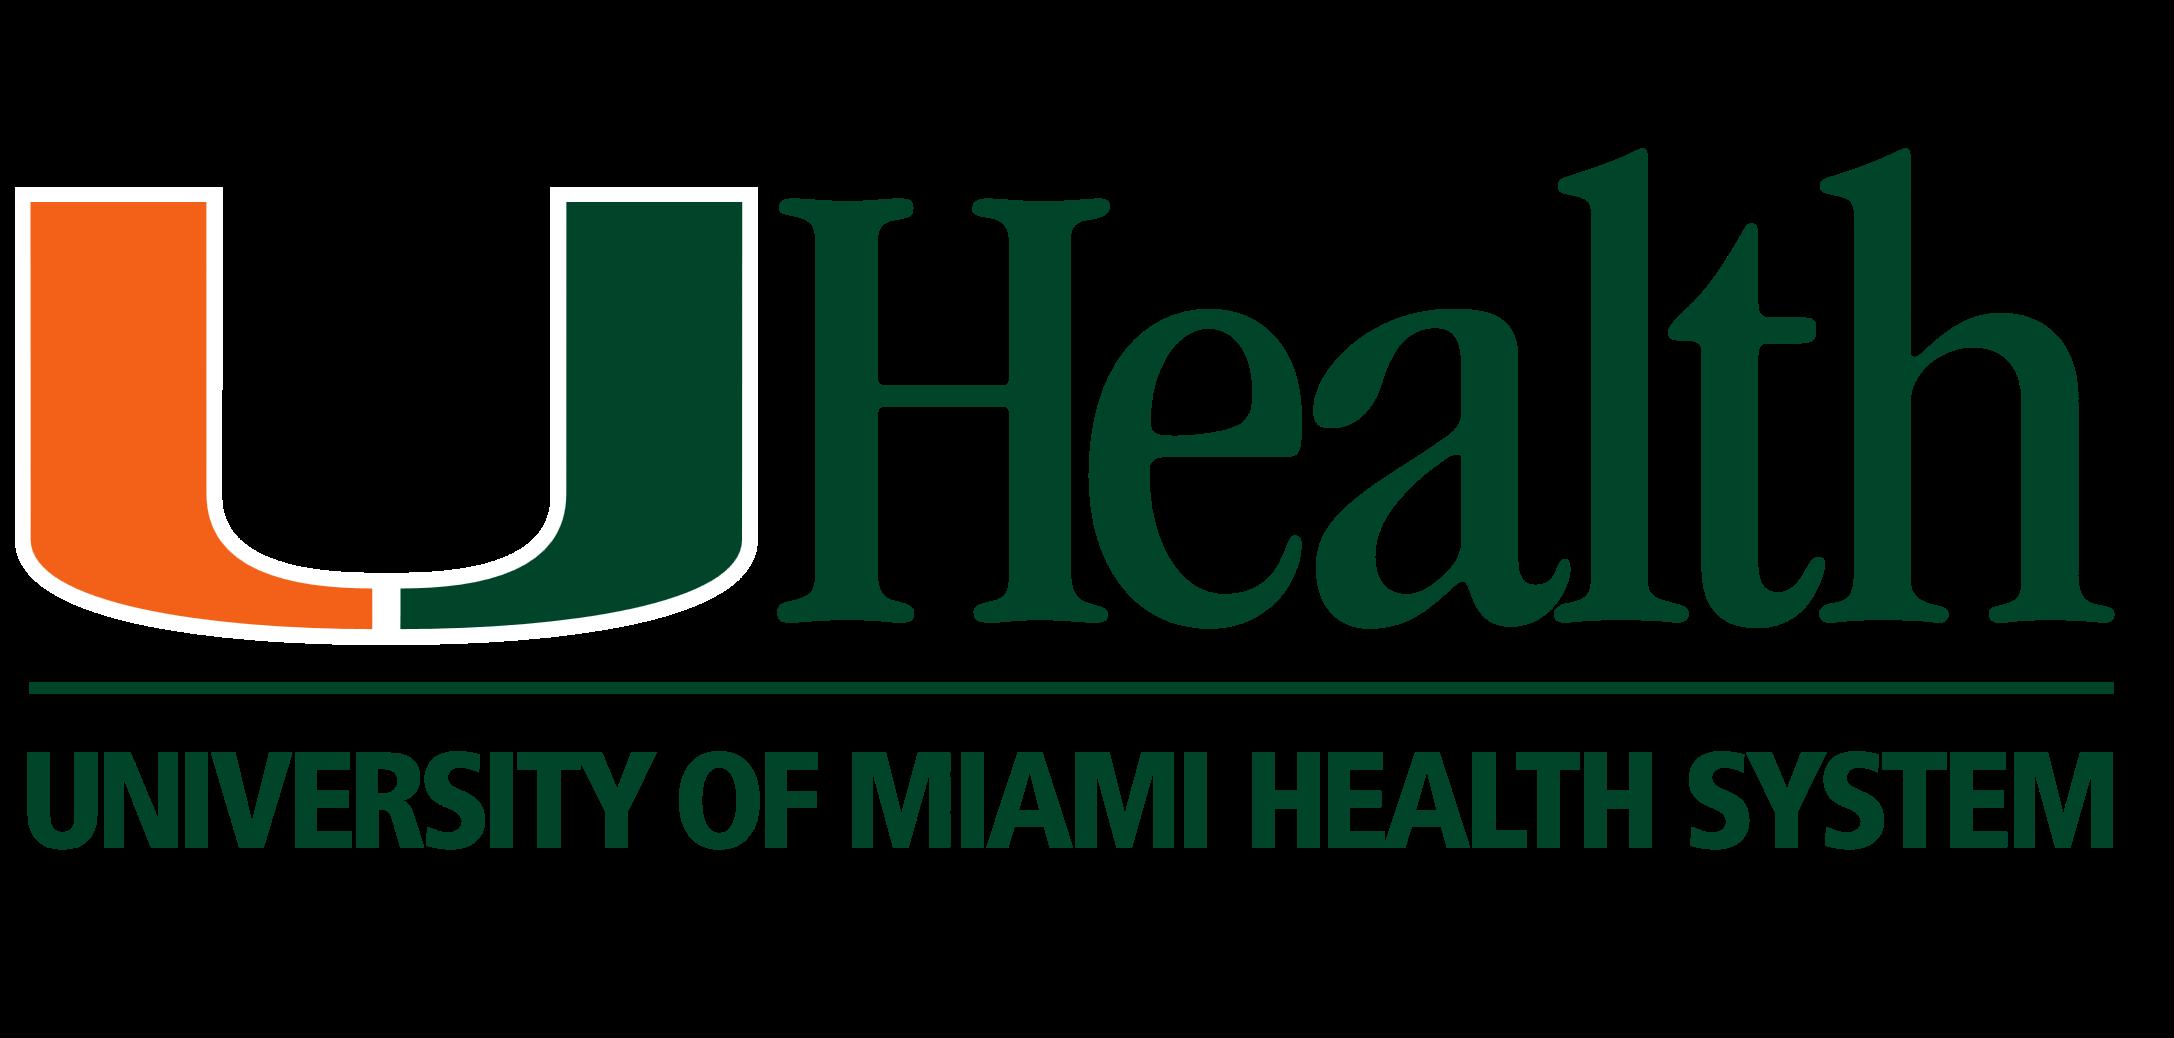 University of Miami Health System Logo